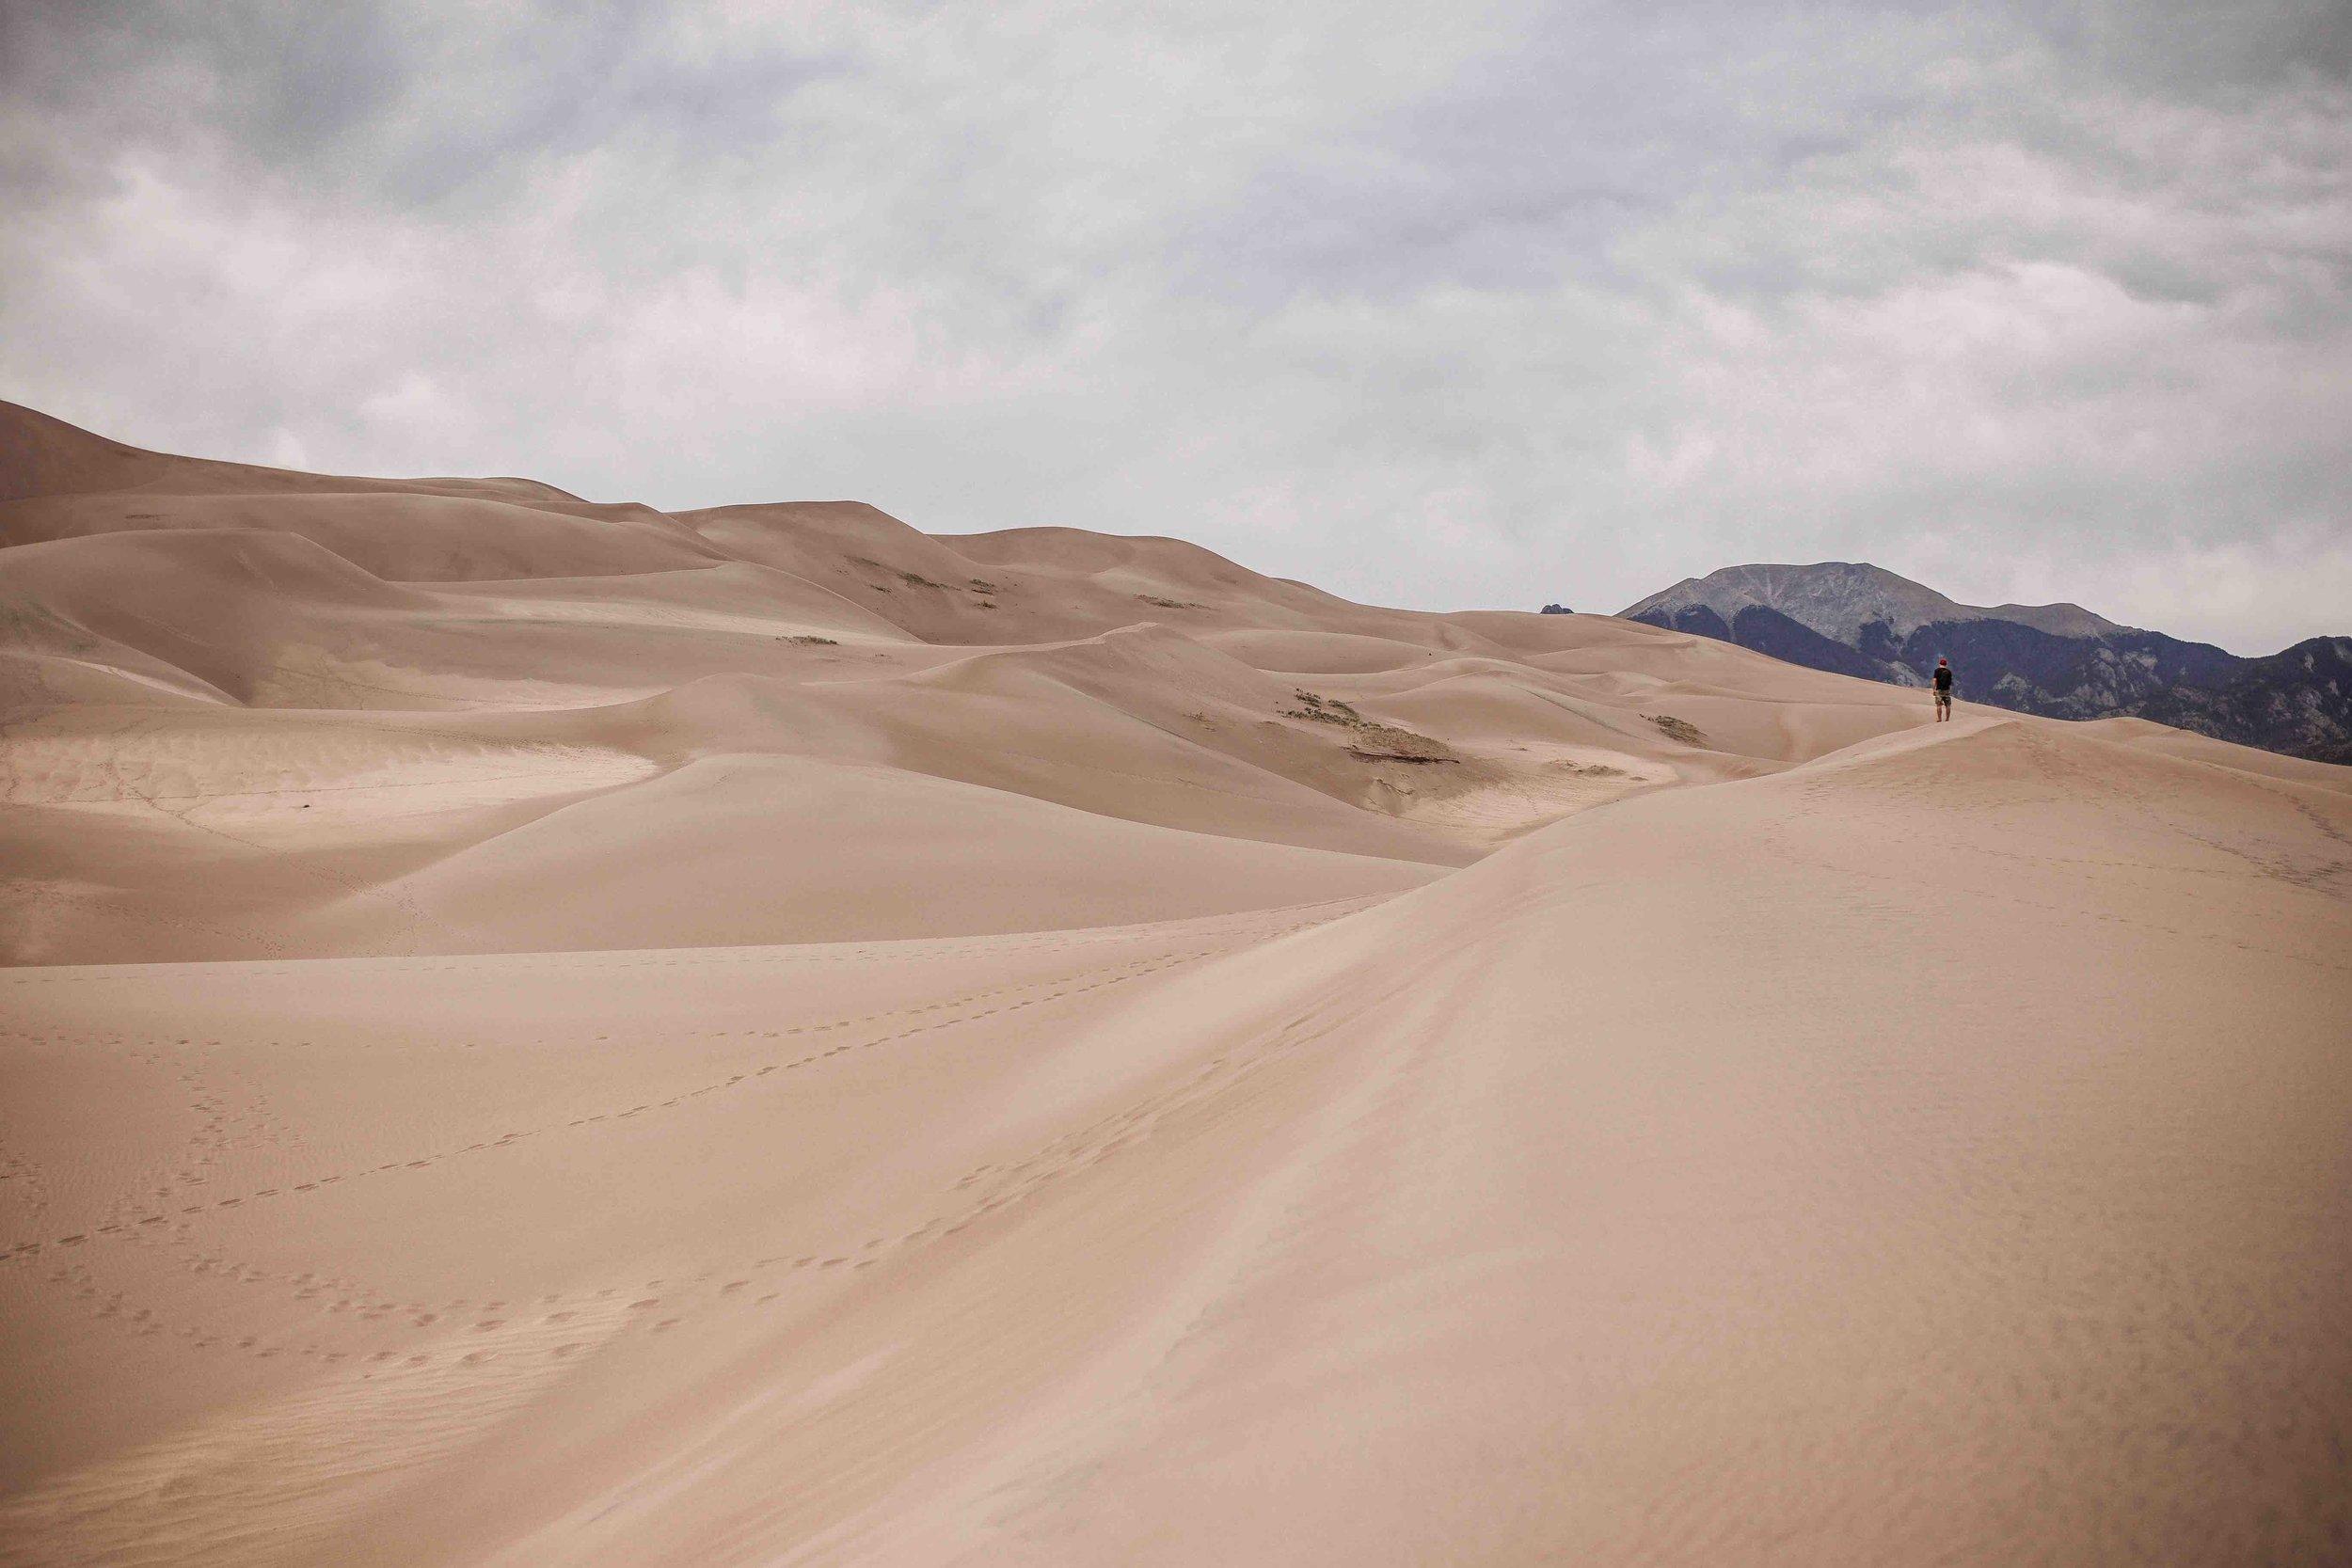 Boondocking near Great Sand Dunes National Park00003.jpeg